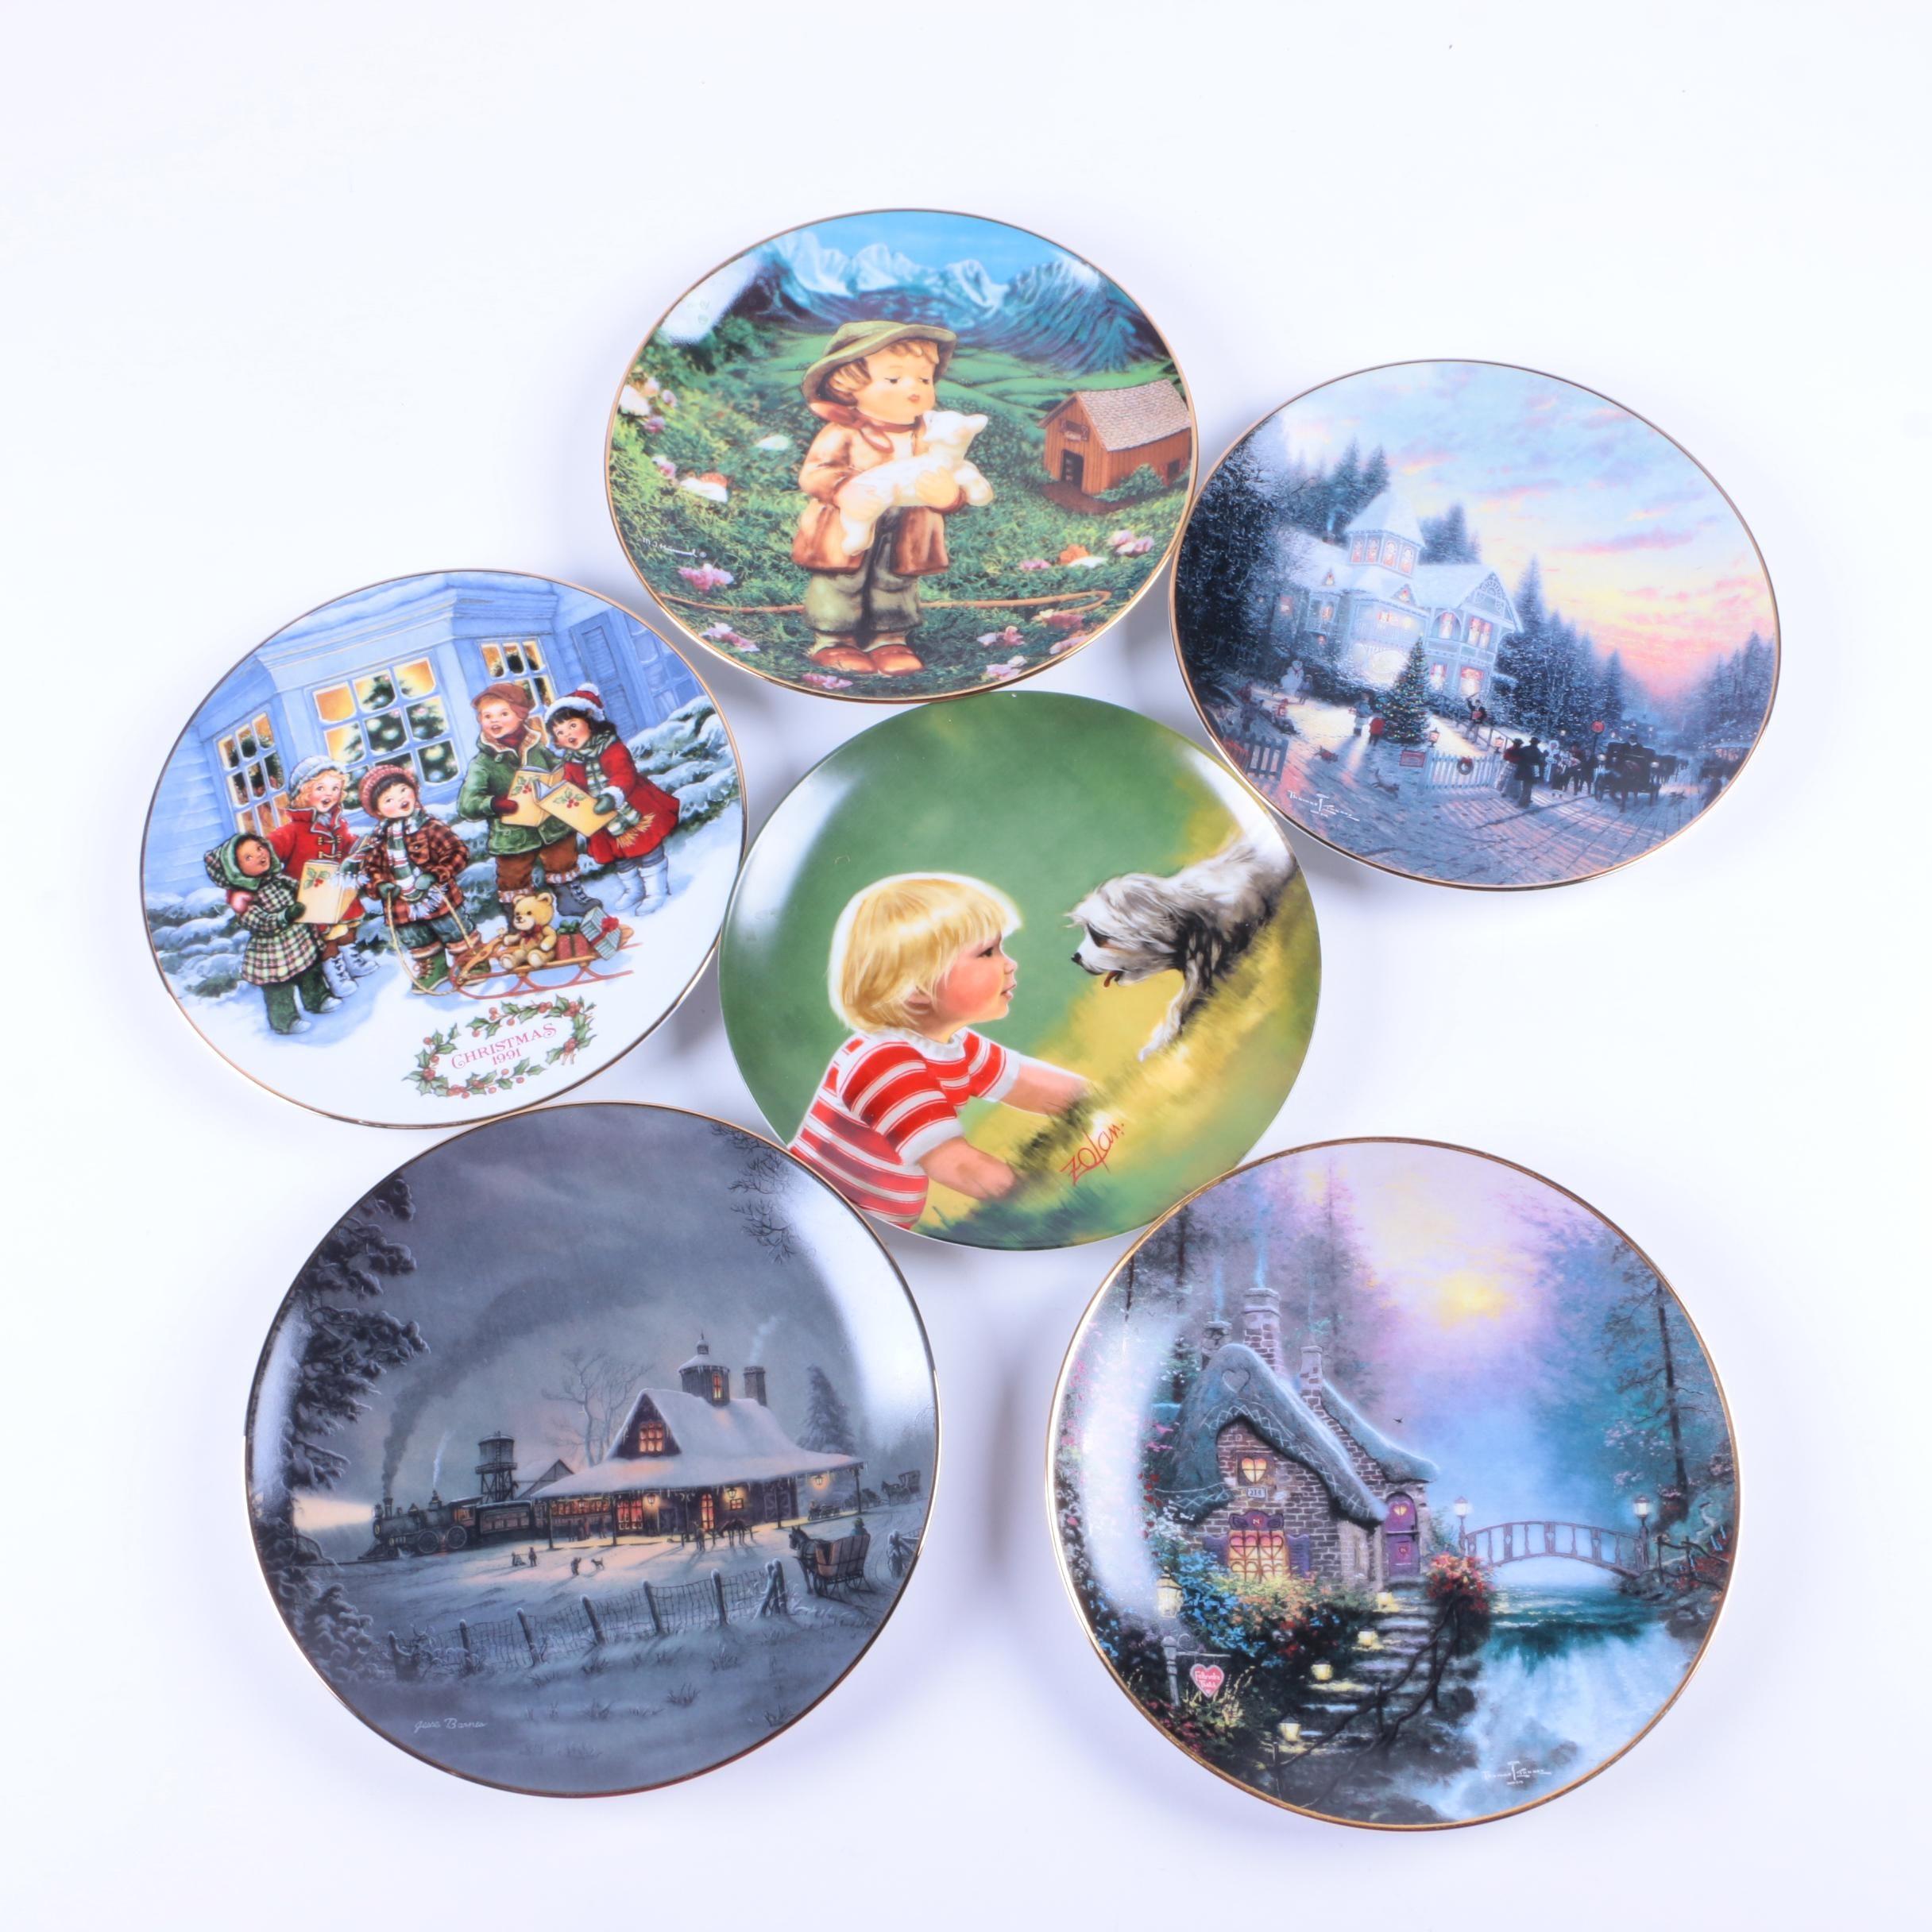 Collectible Plates Including Hummel and Thomas Kinkade